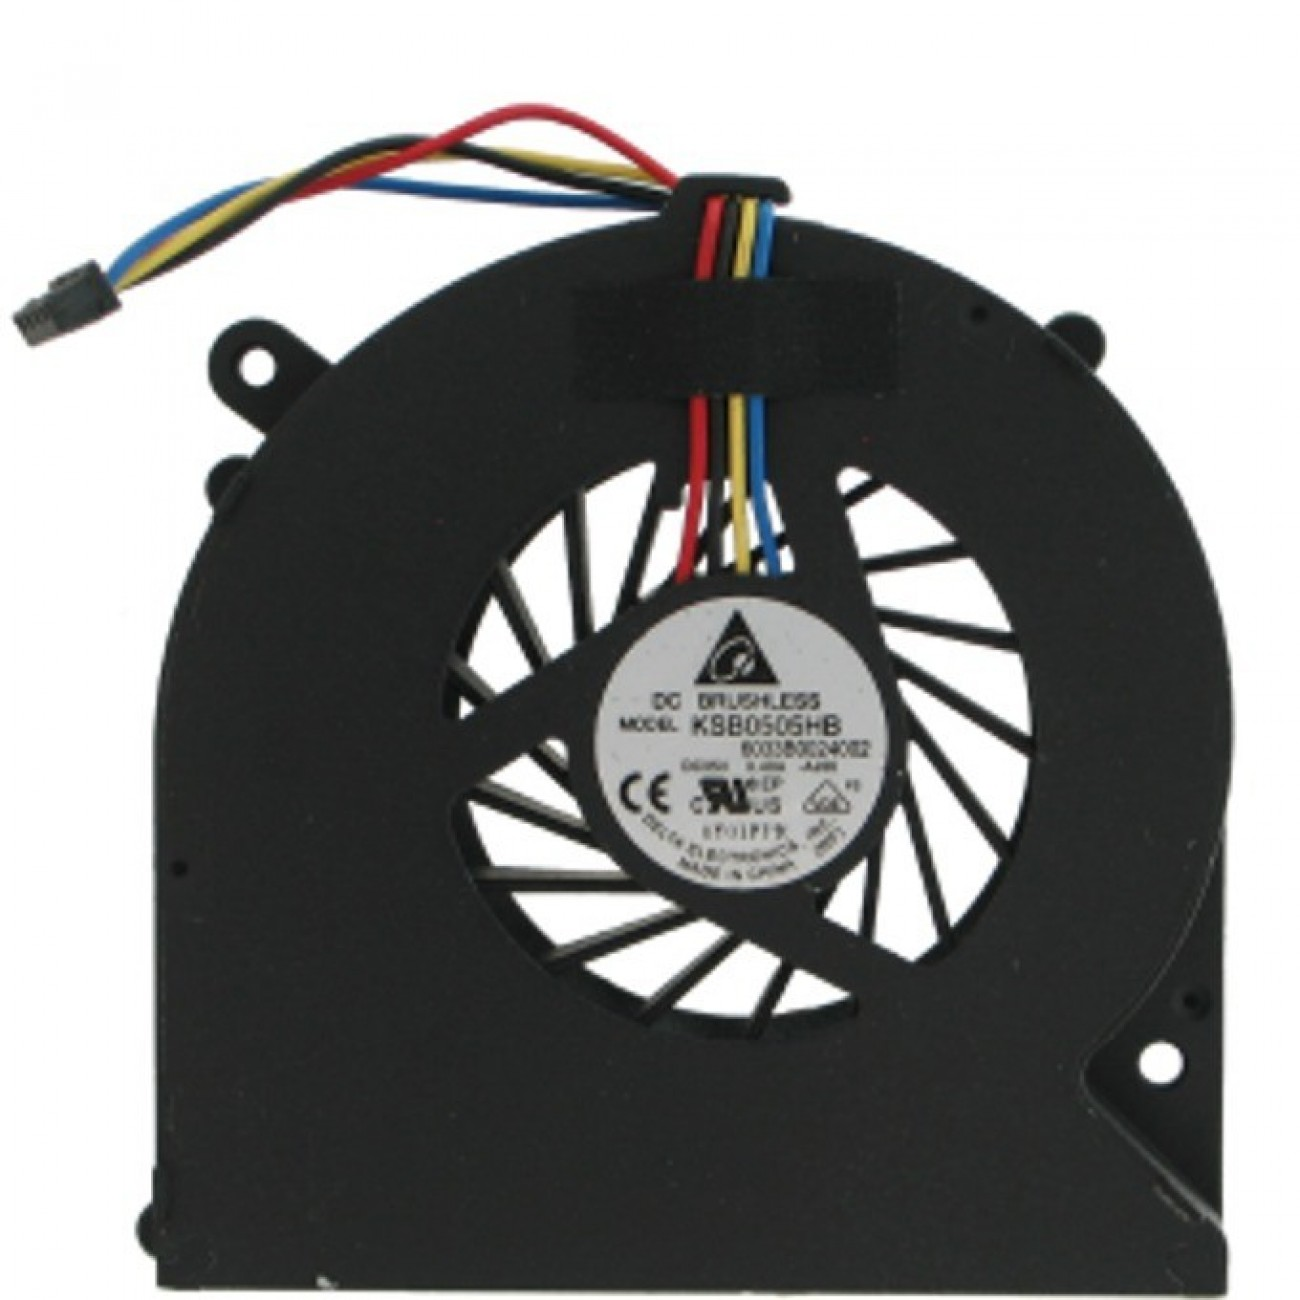 Вентилатор за лаптоп, Toshiba C600, C655, C650, L630, 4 Pin, TYPE 3 в Резервни части -  | Alleop